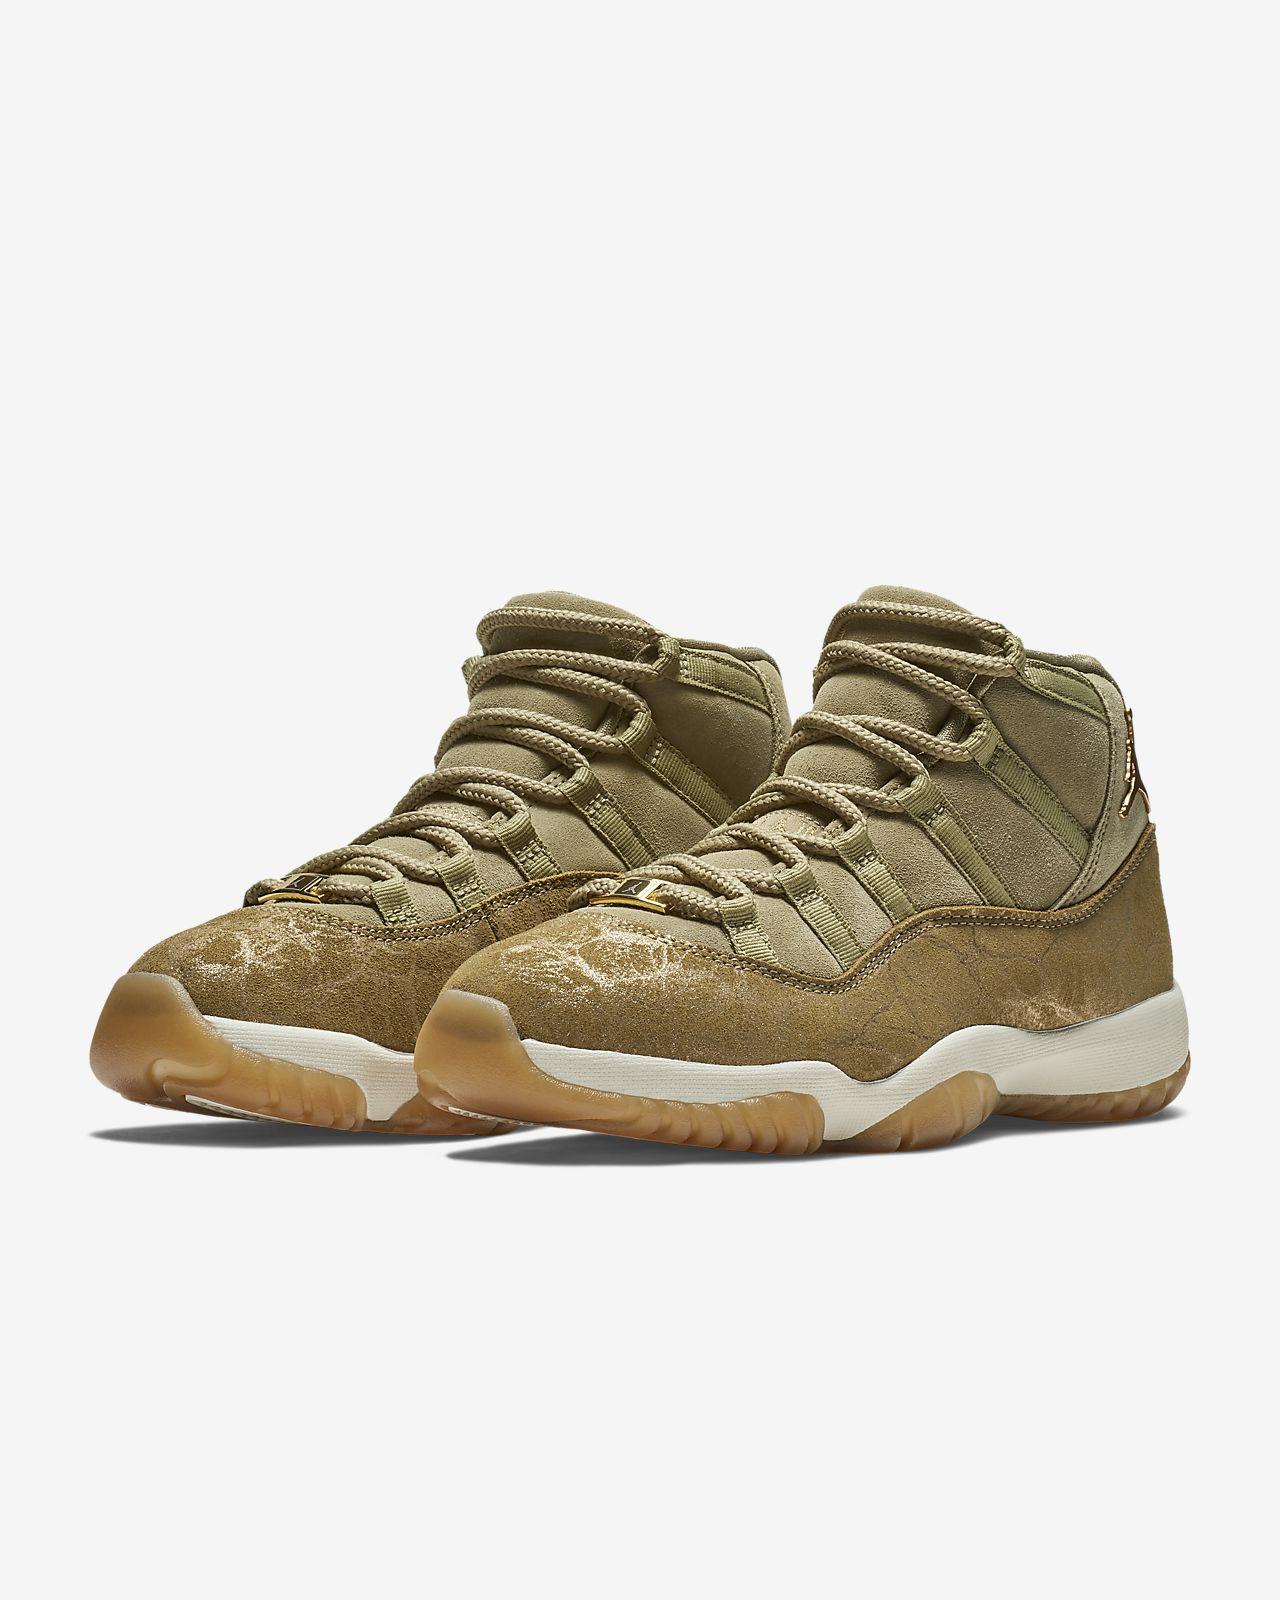 quality design 50545 1d5b0 ... Air Jordan 11 Retro Women s Shoe